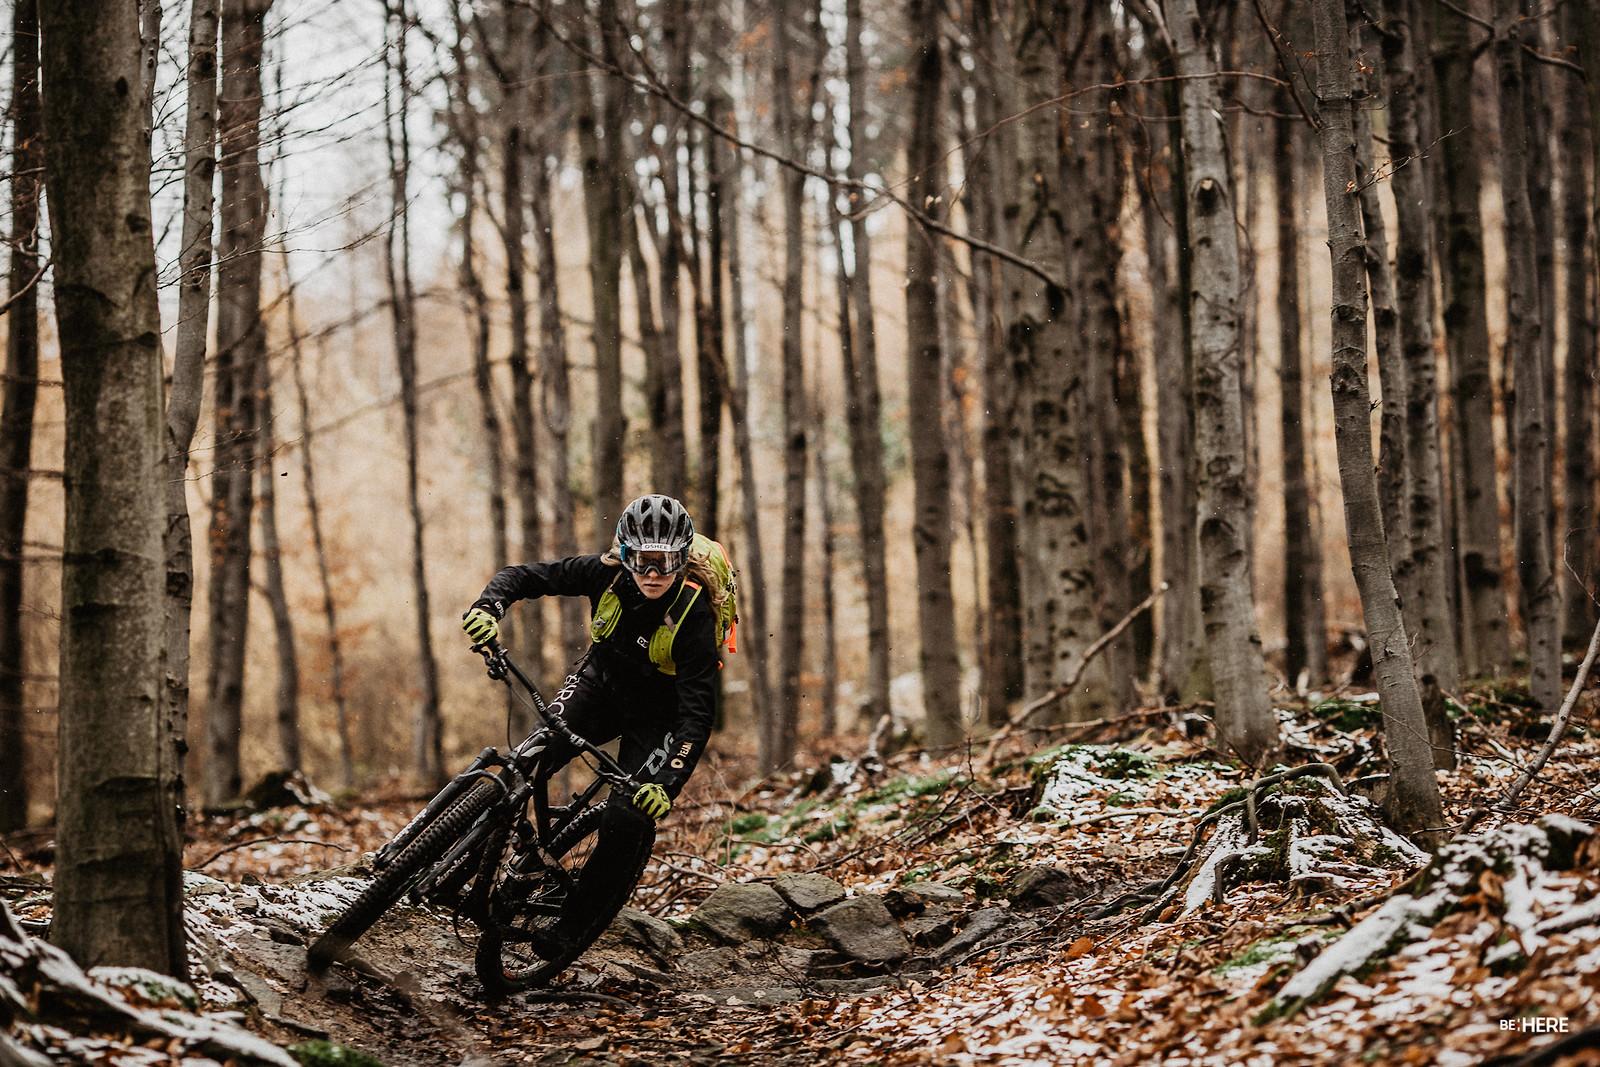 BeHere.photo rider: Sonia Skrzypnik - BeHere.photo - Mountain Biking Pictures - Vital MTB